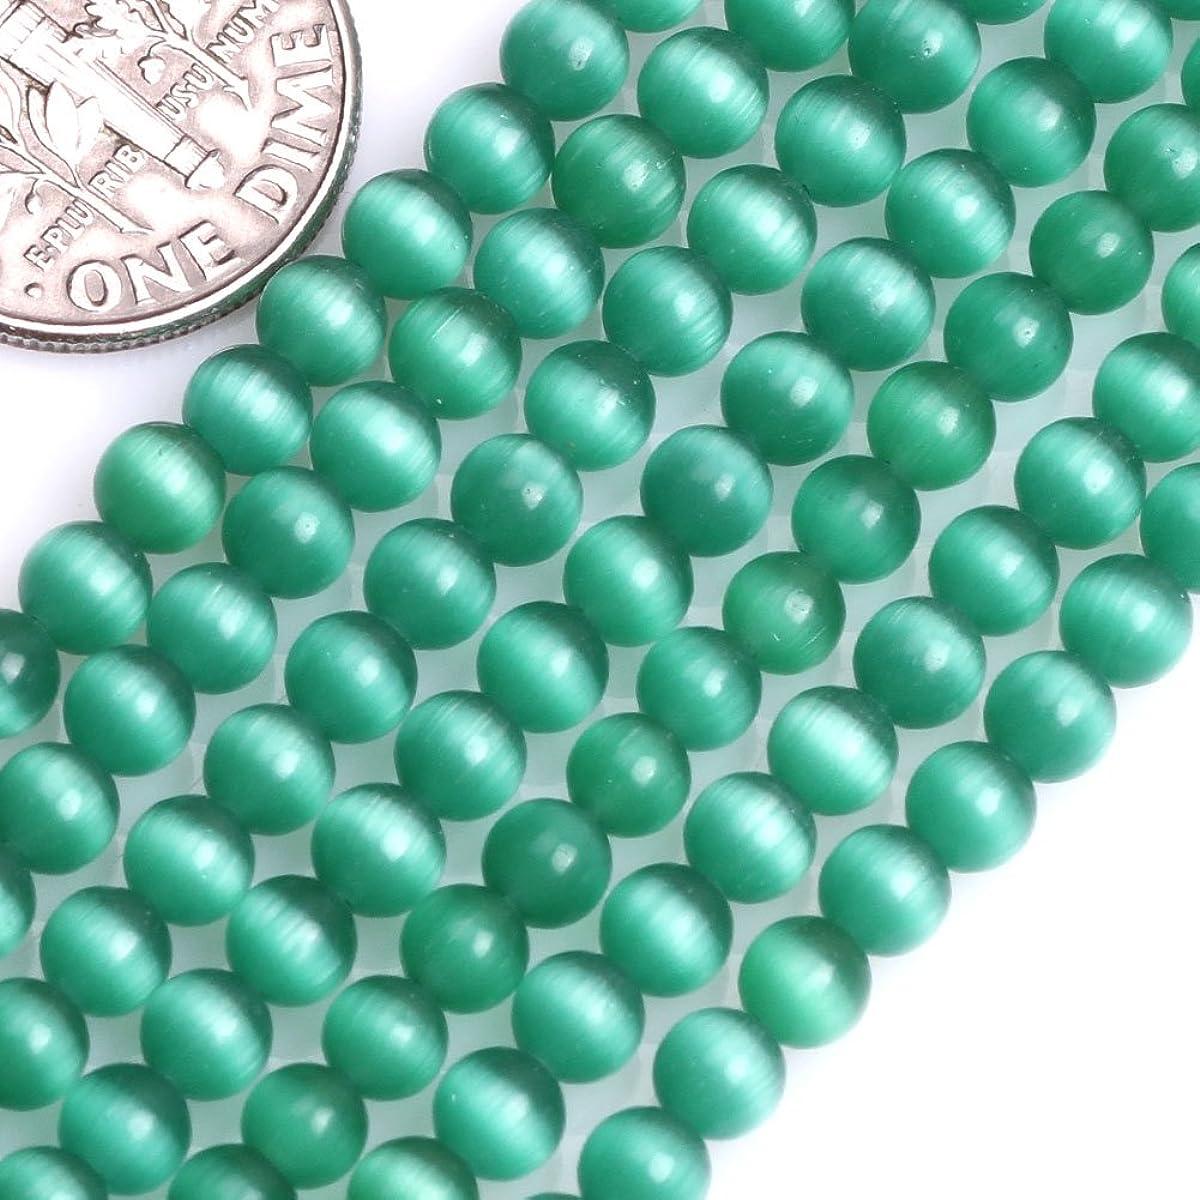 GEM-Inside Cat Eye Gemstone Loose Beads 4mm Round Drak Green Crystal Energy Stone Power Beads for Jewelry Making 14 inch